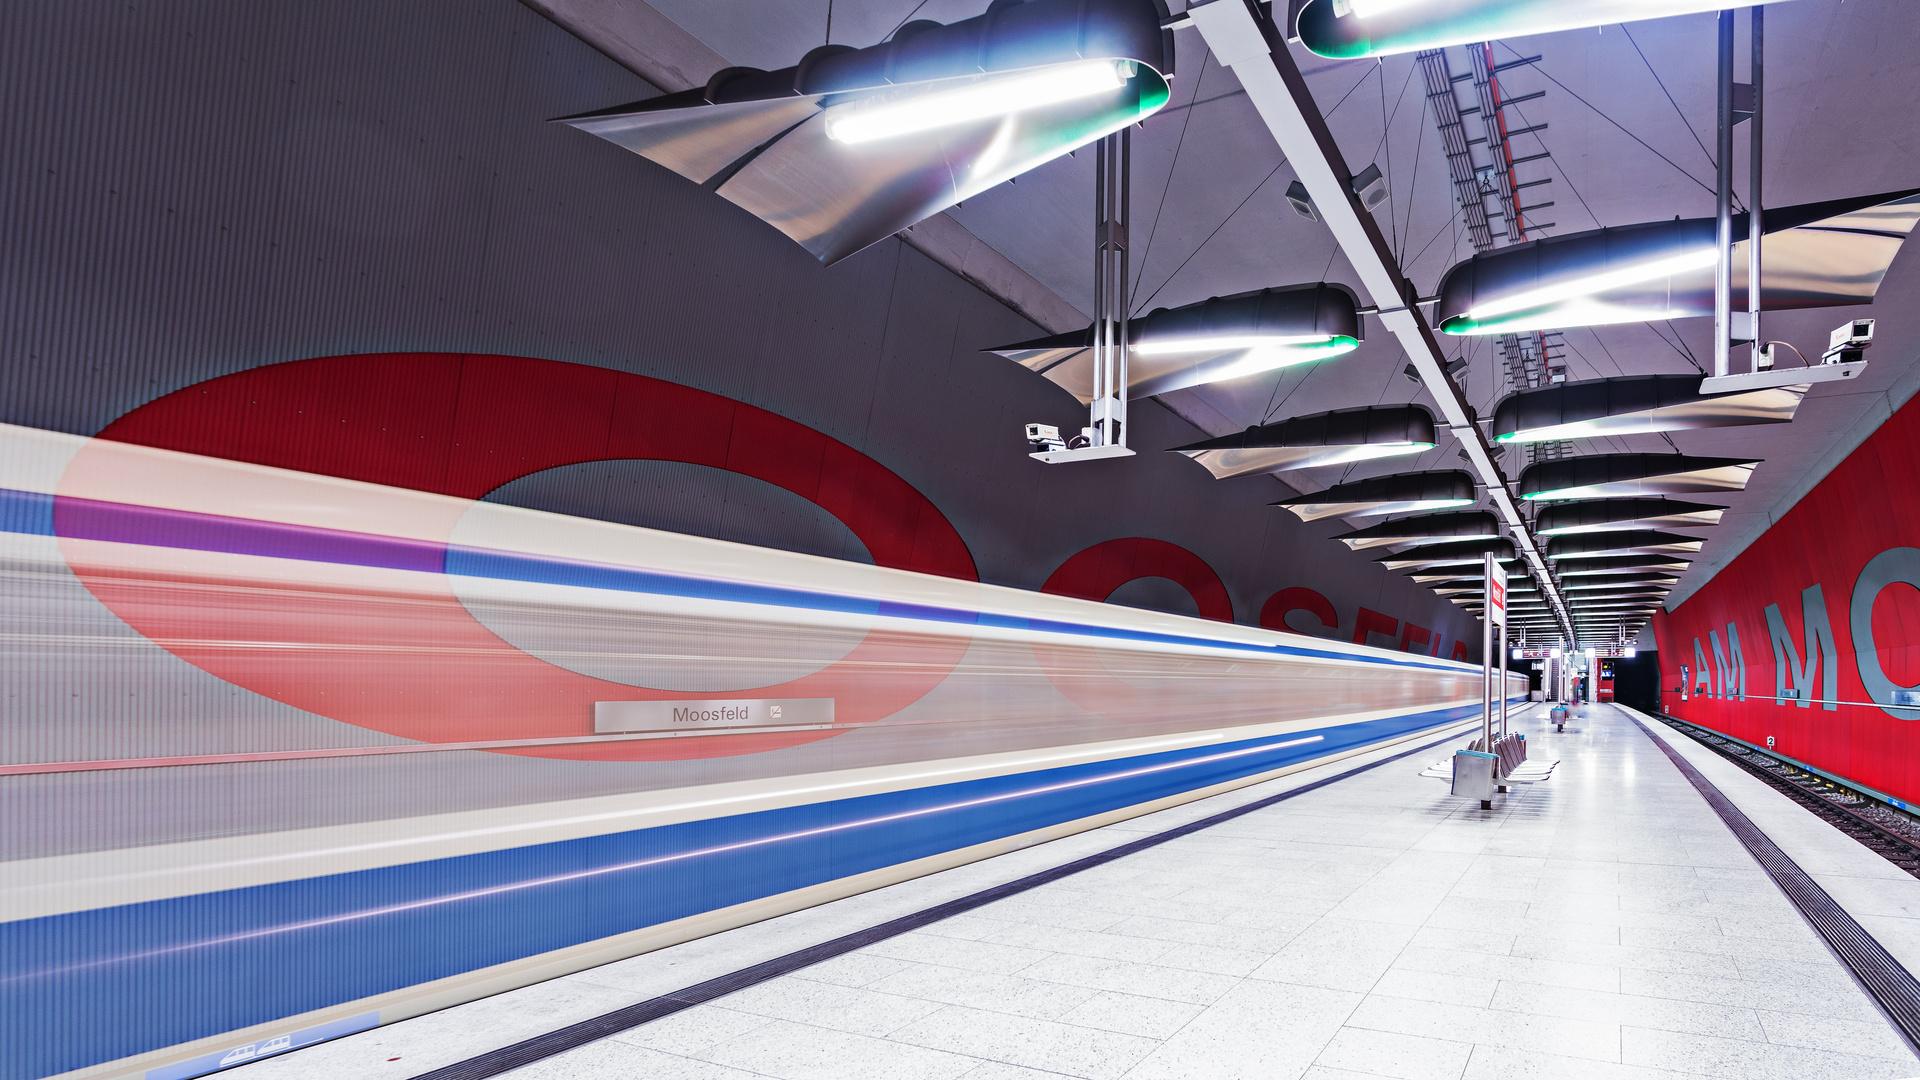 U-Bahn_MUC III043_20170702